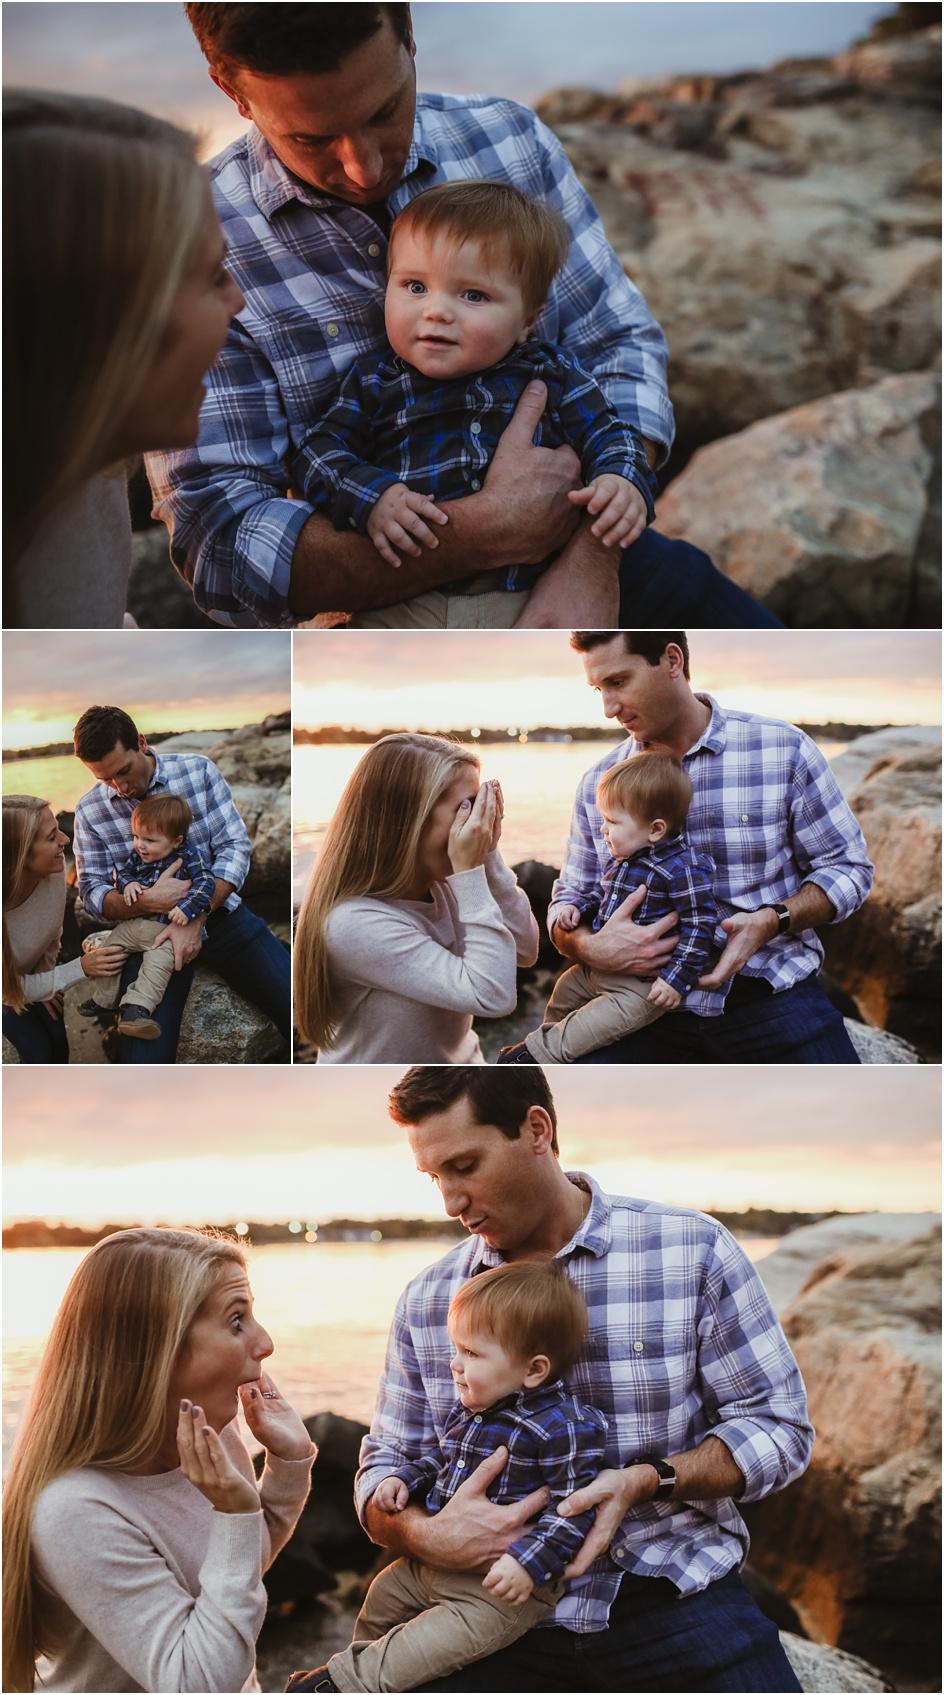 fallfamilysession-fairfieldcountyct-kristinwoodphotogrpahy.jpg